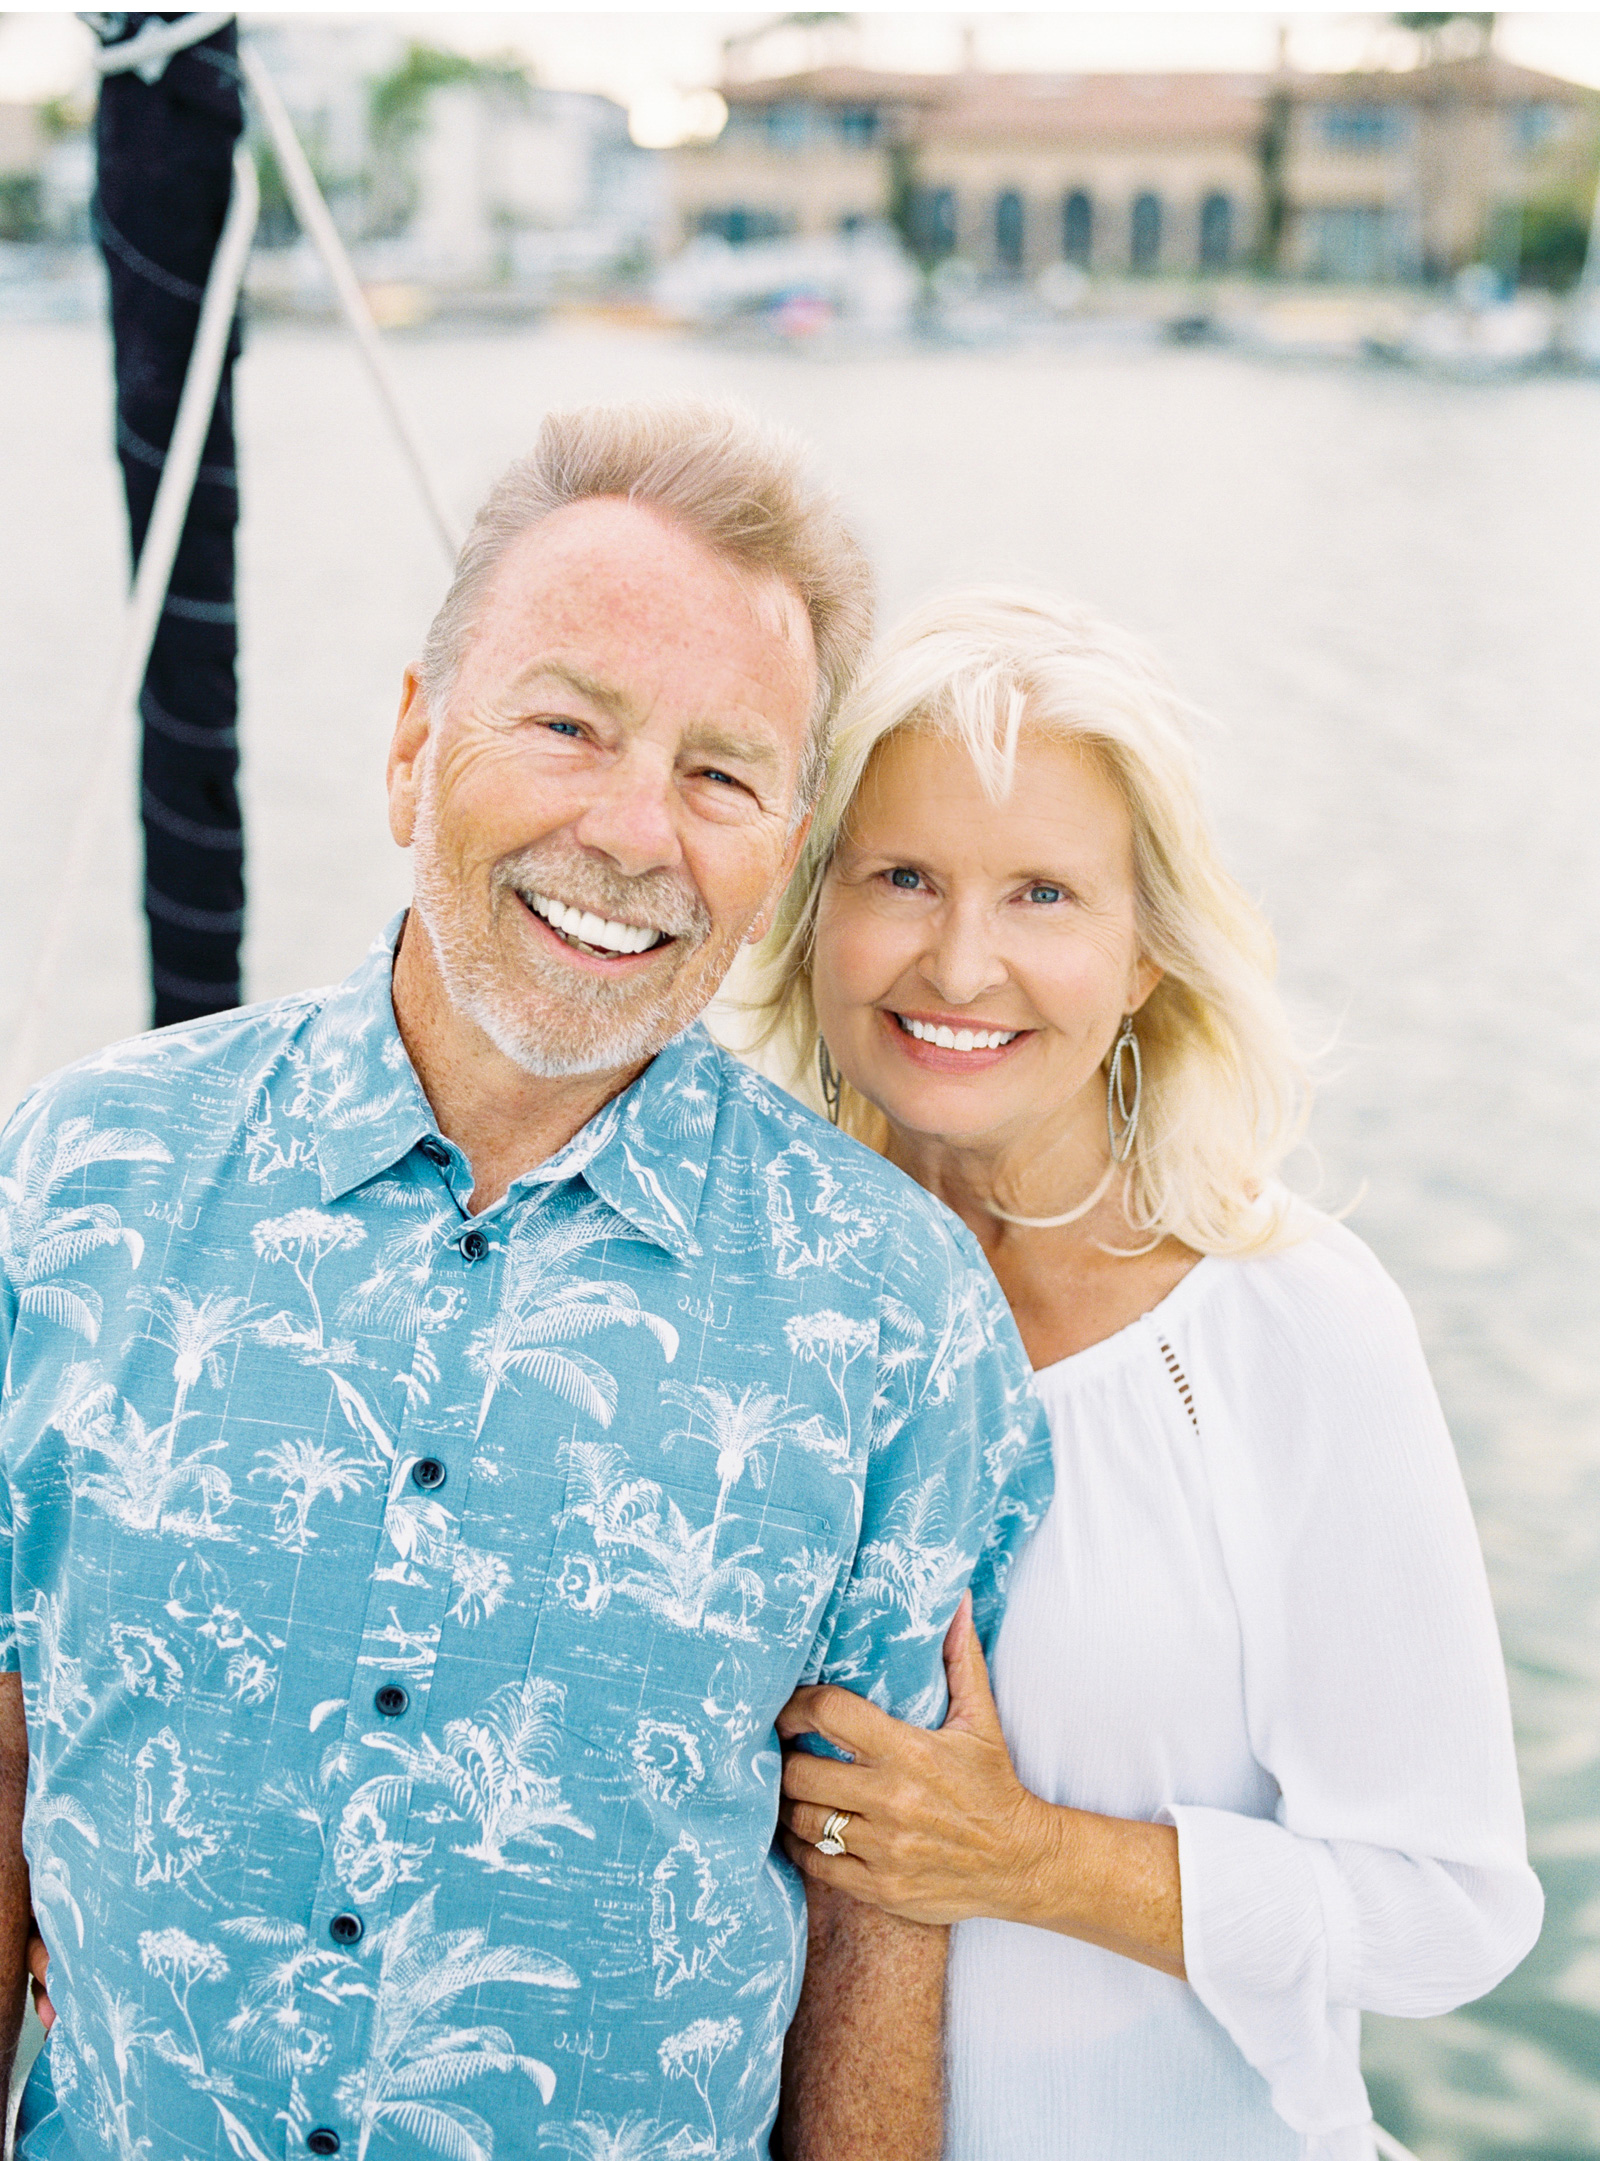 Anniversaries-on-the-Water-Long-Beach-Anniversary-Southern-California-Wedding-Photographer-Fine-Art-Wedding-Photos-Anniversary-on-Boat-Natalie-Schutt-Photography_07.jpg